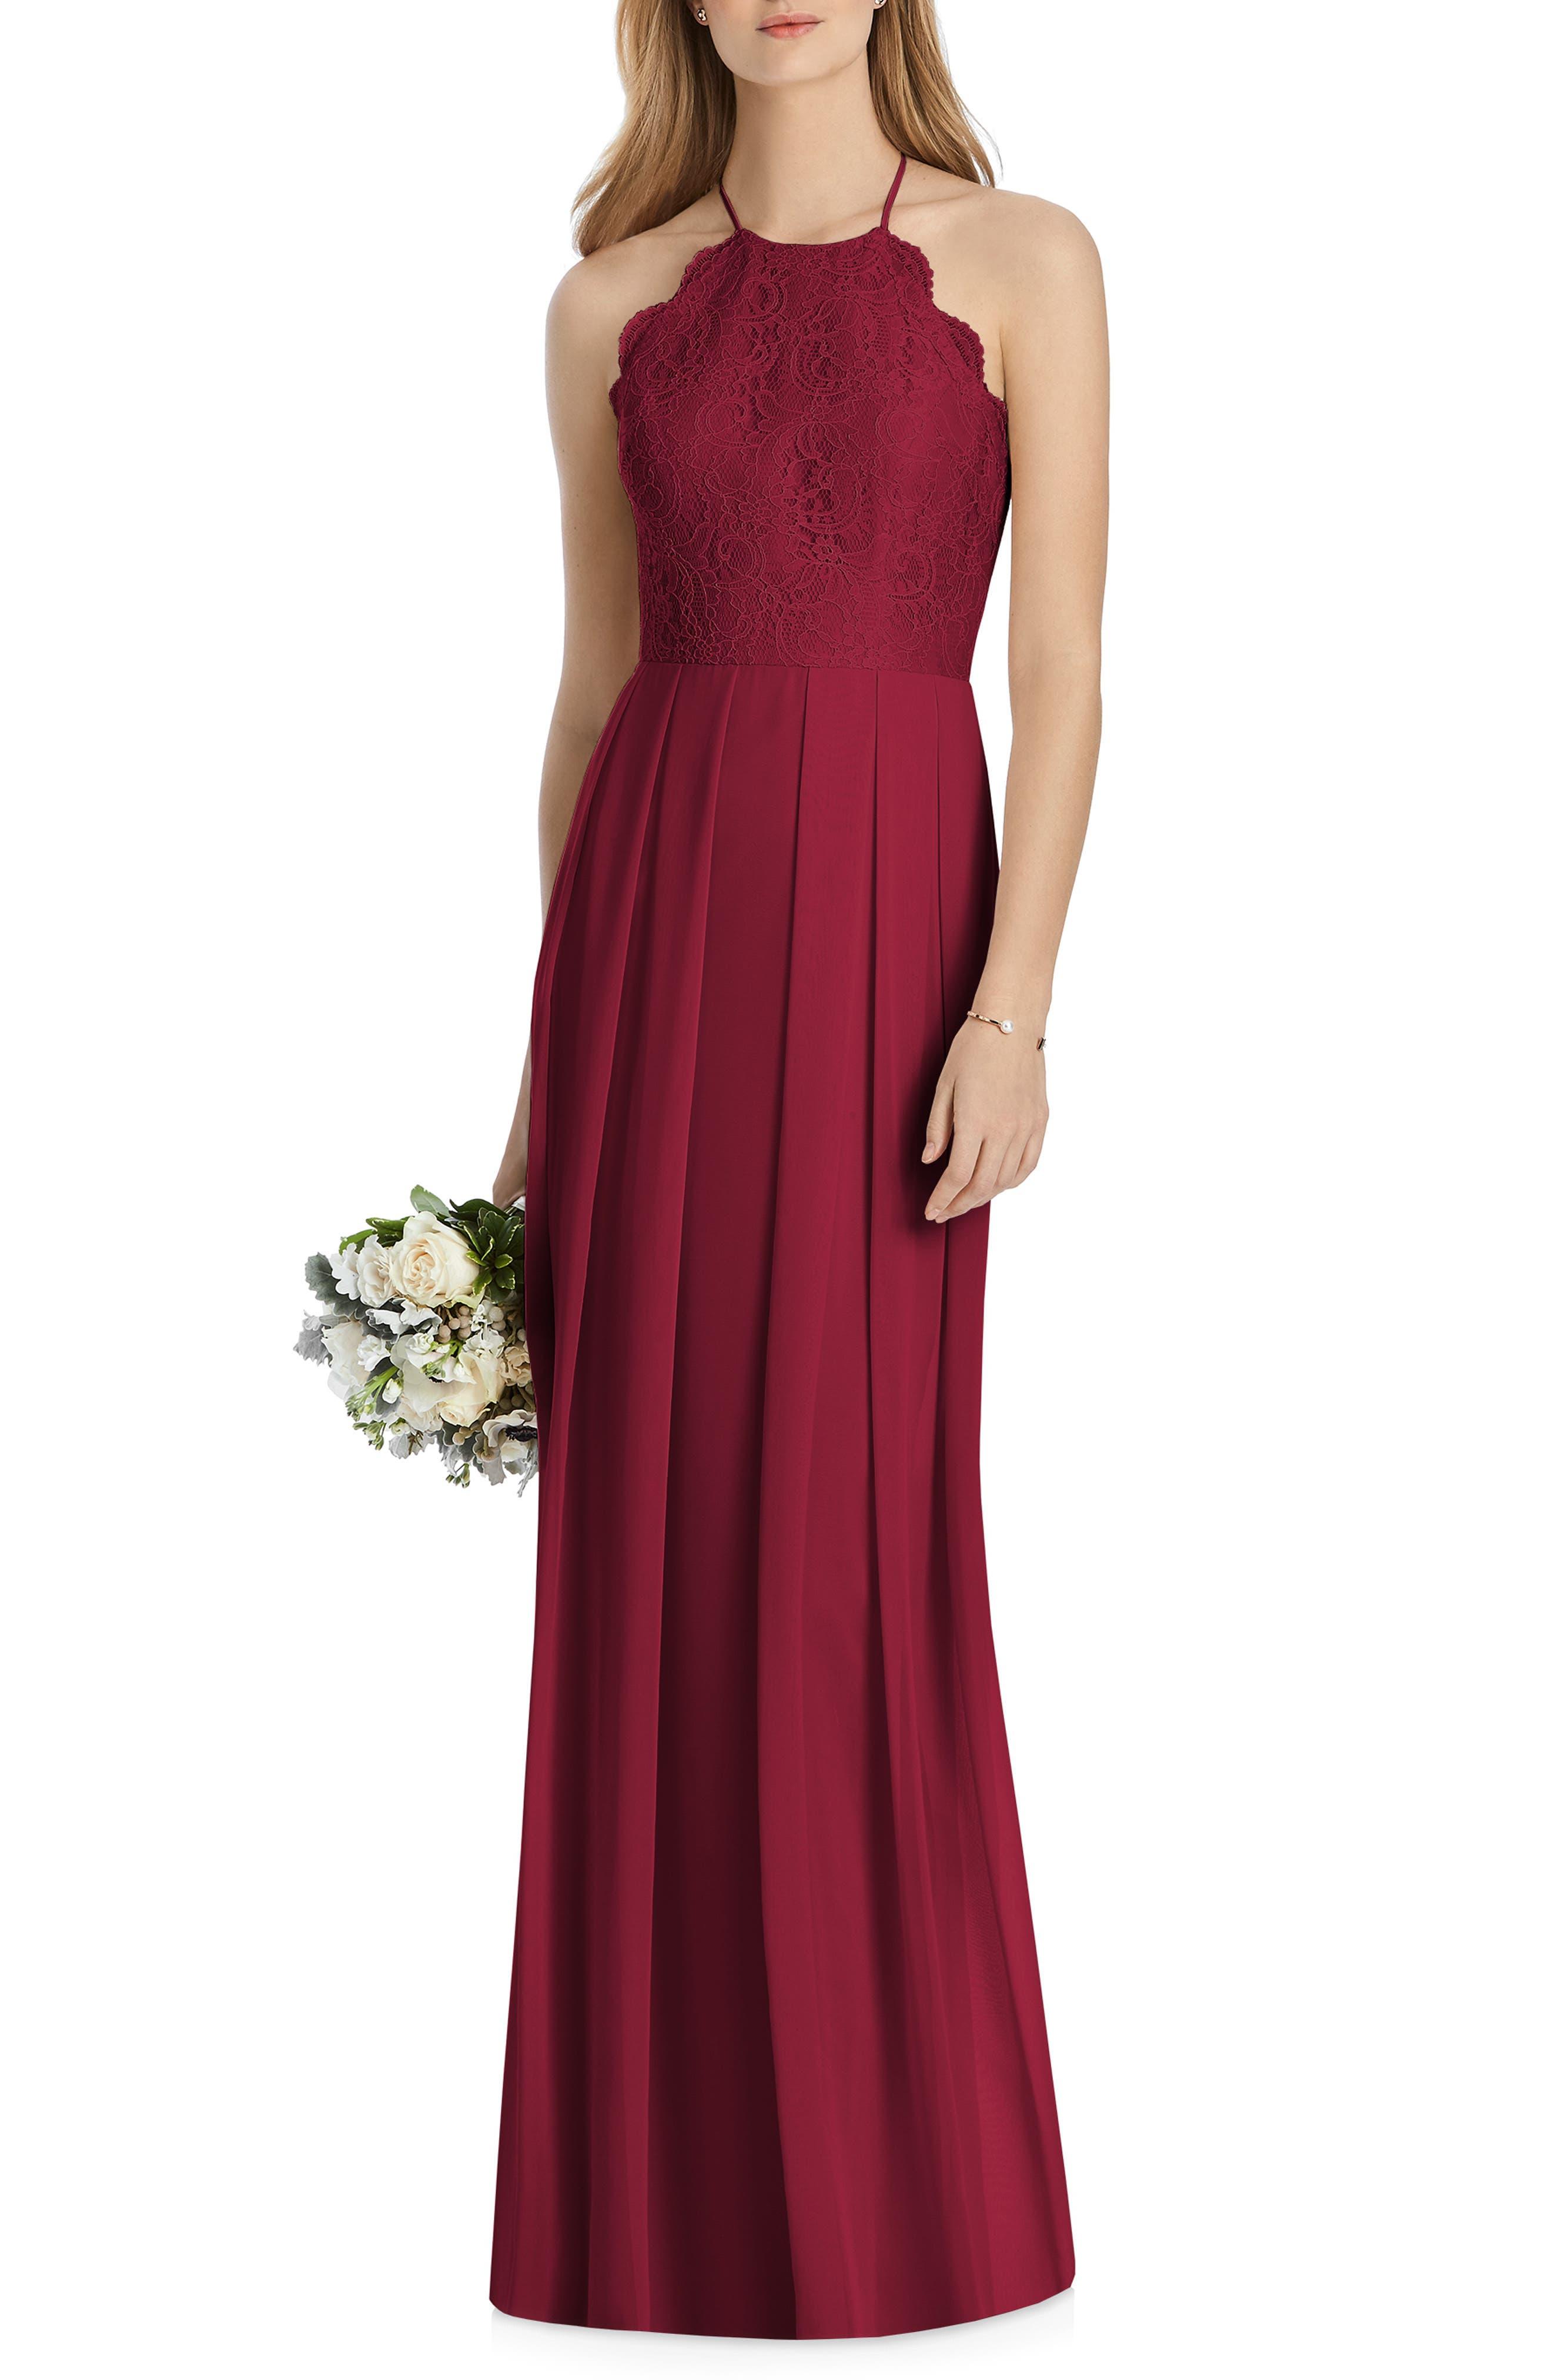 Lela Rose Bridesmaid Lux Chiffon Dress, Red